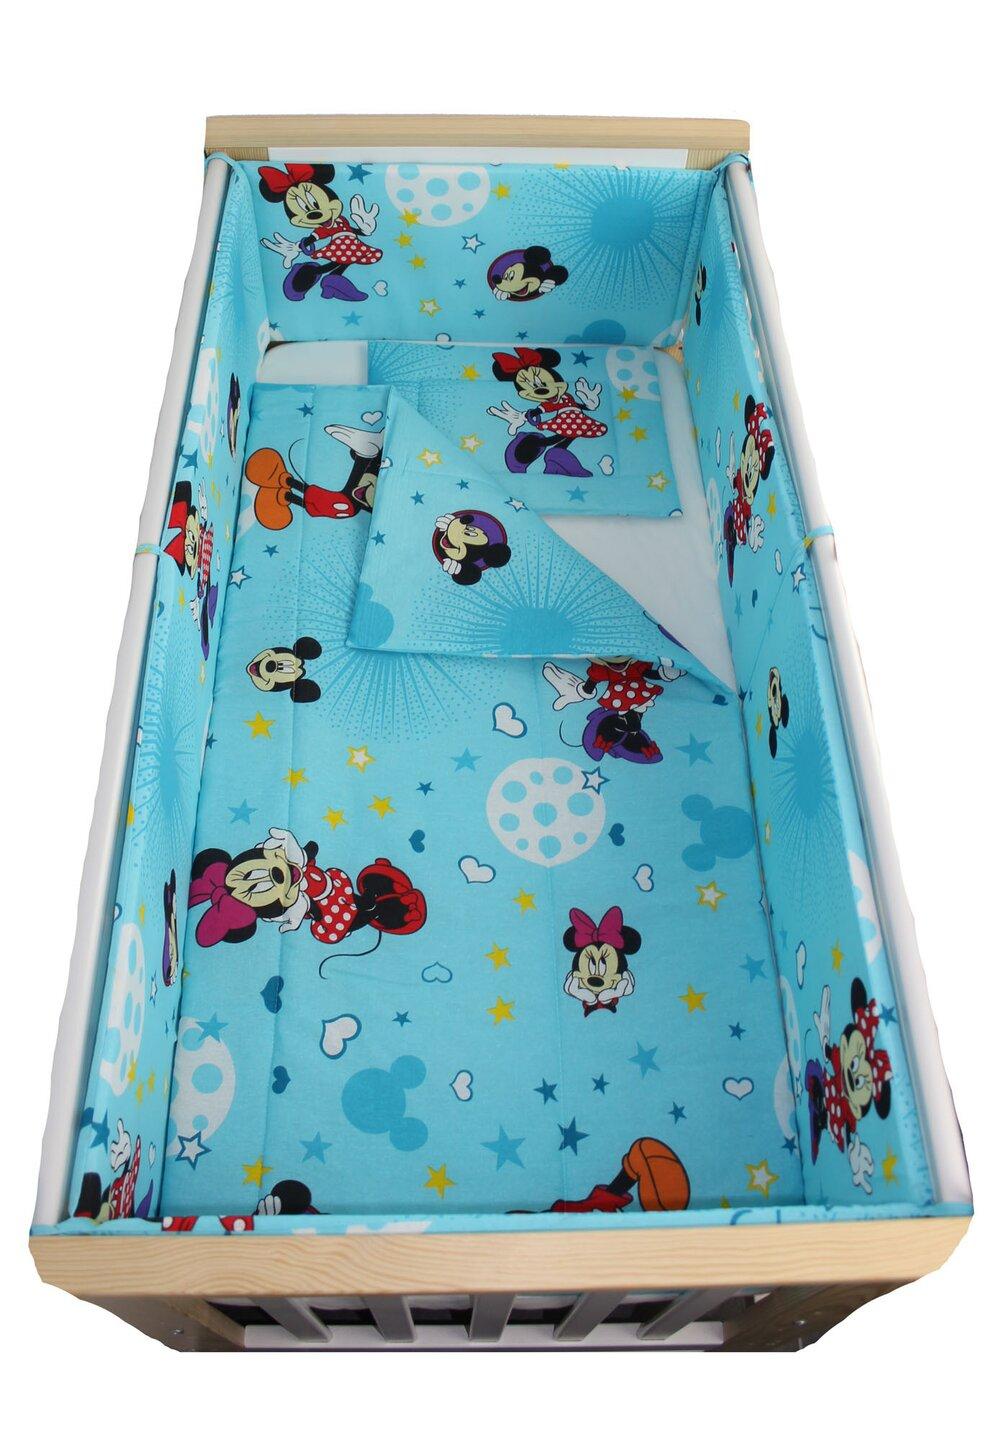 Lenjerie 5 piese, Minnie si Mickey, albastra cu stelute, 120x60cm imagine